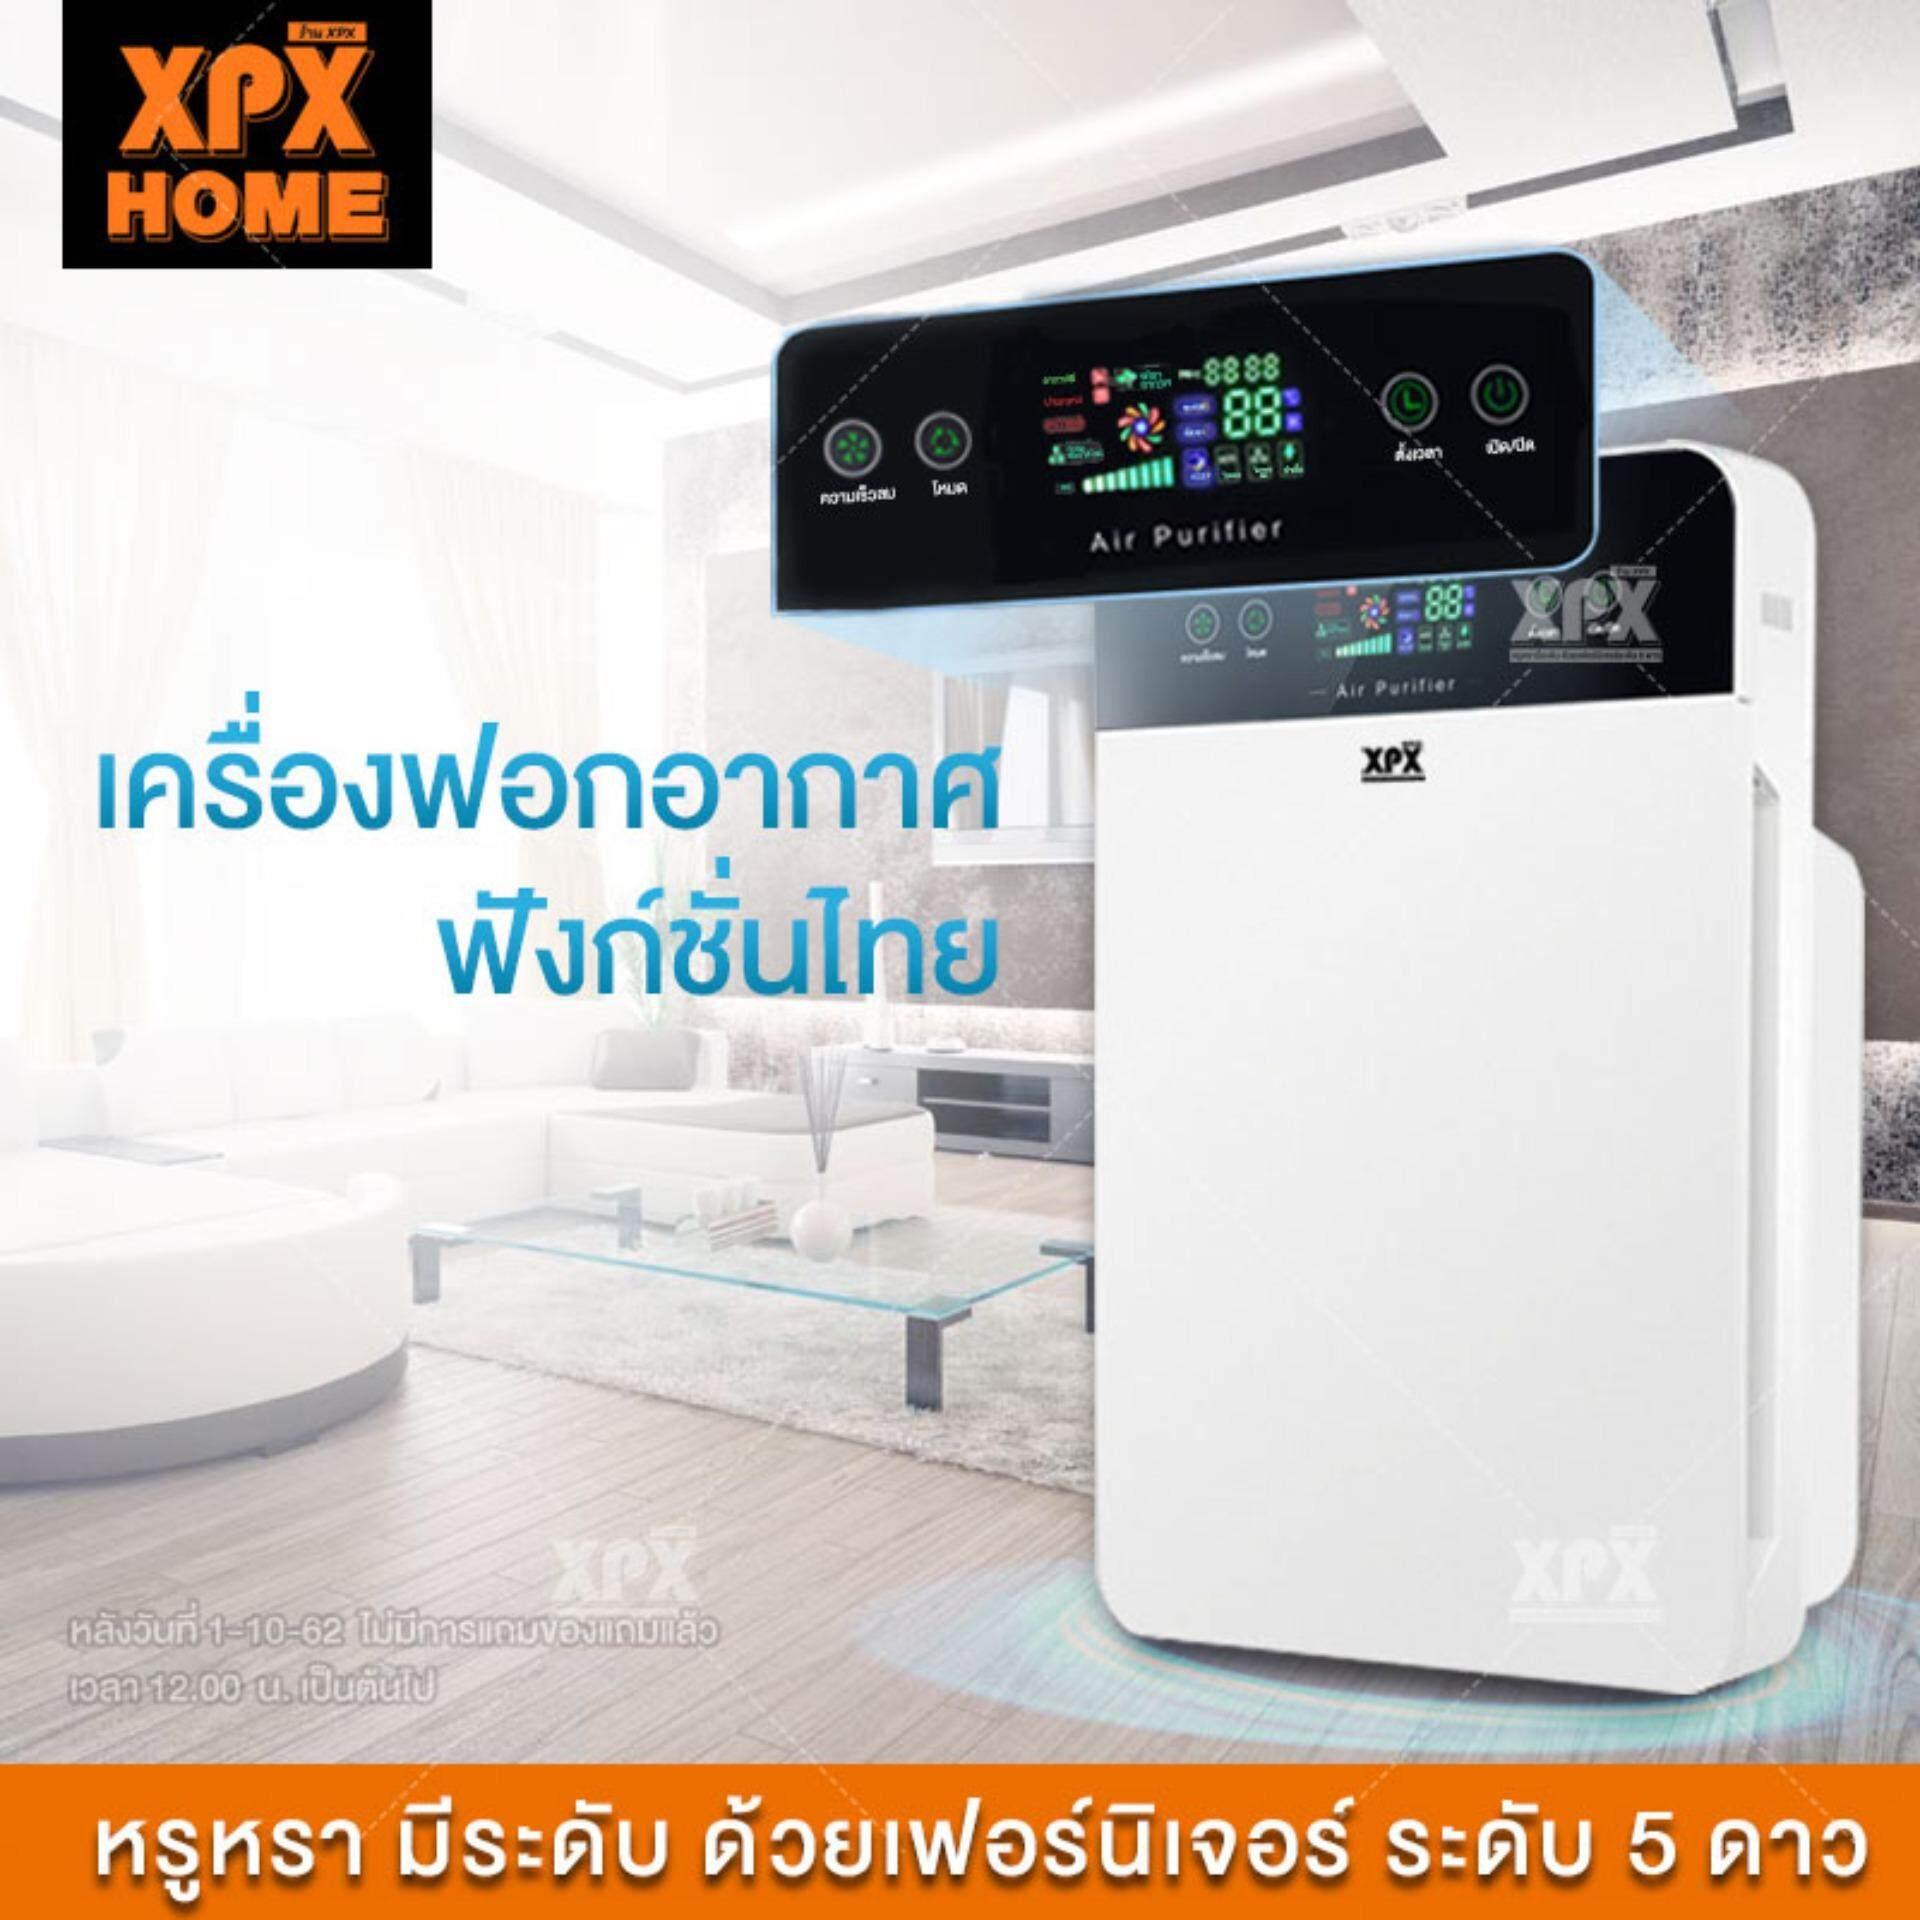 XPX เครื่องฟอกอากาศ เครื่องฟอกอากาศฟังก์ชั่นภาษาไทย สำหรับห้อง 32 ตร.ม. กรองได้ประสิทธิภาพมากที่สุด กรองฝุ่น ควัน และสารก่อภูมิแพ้ ไรฝุ่น JD55